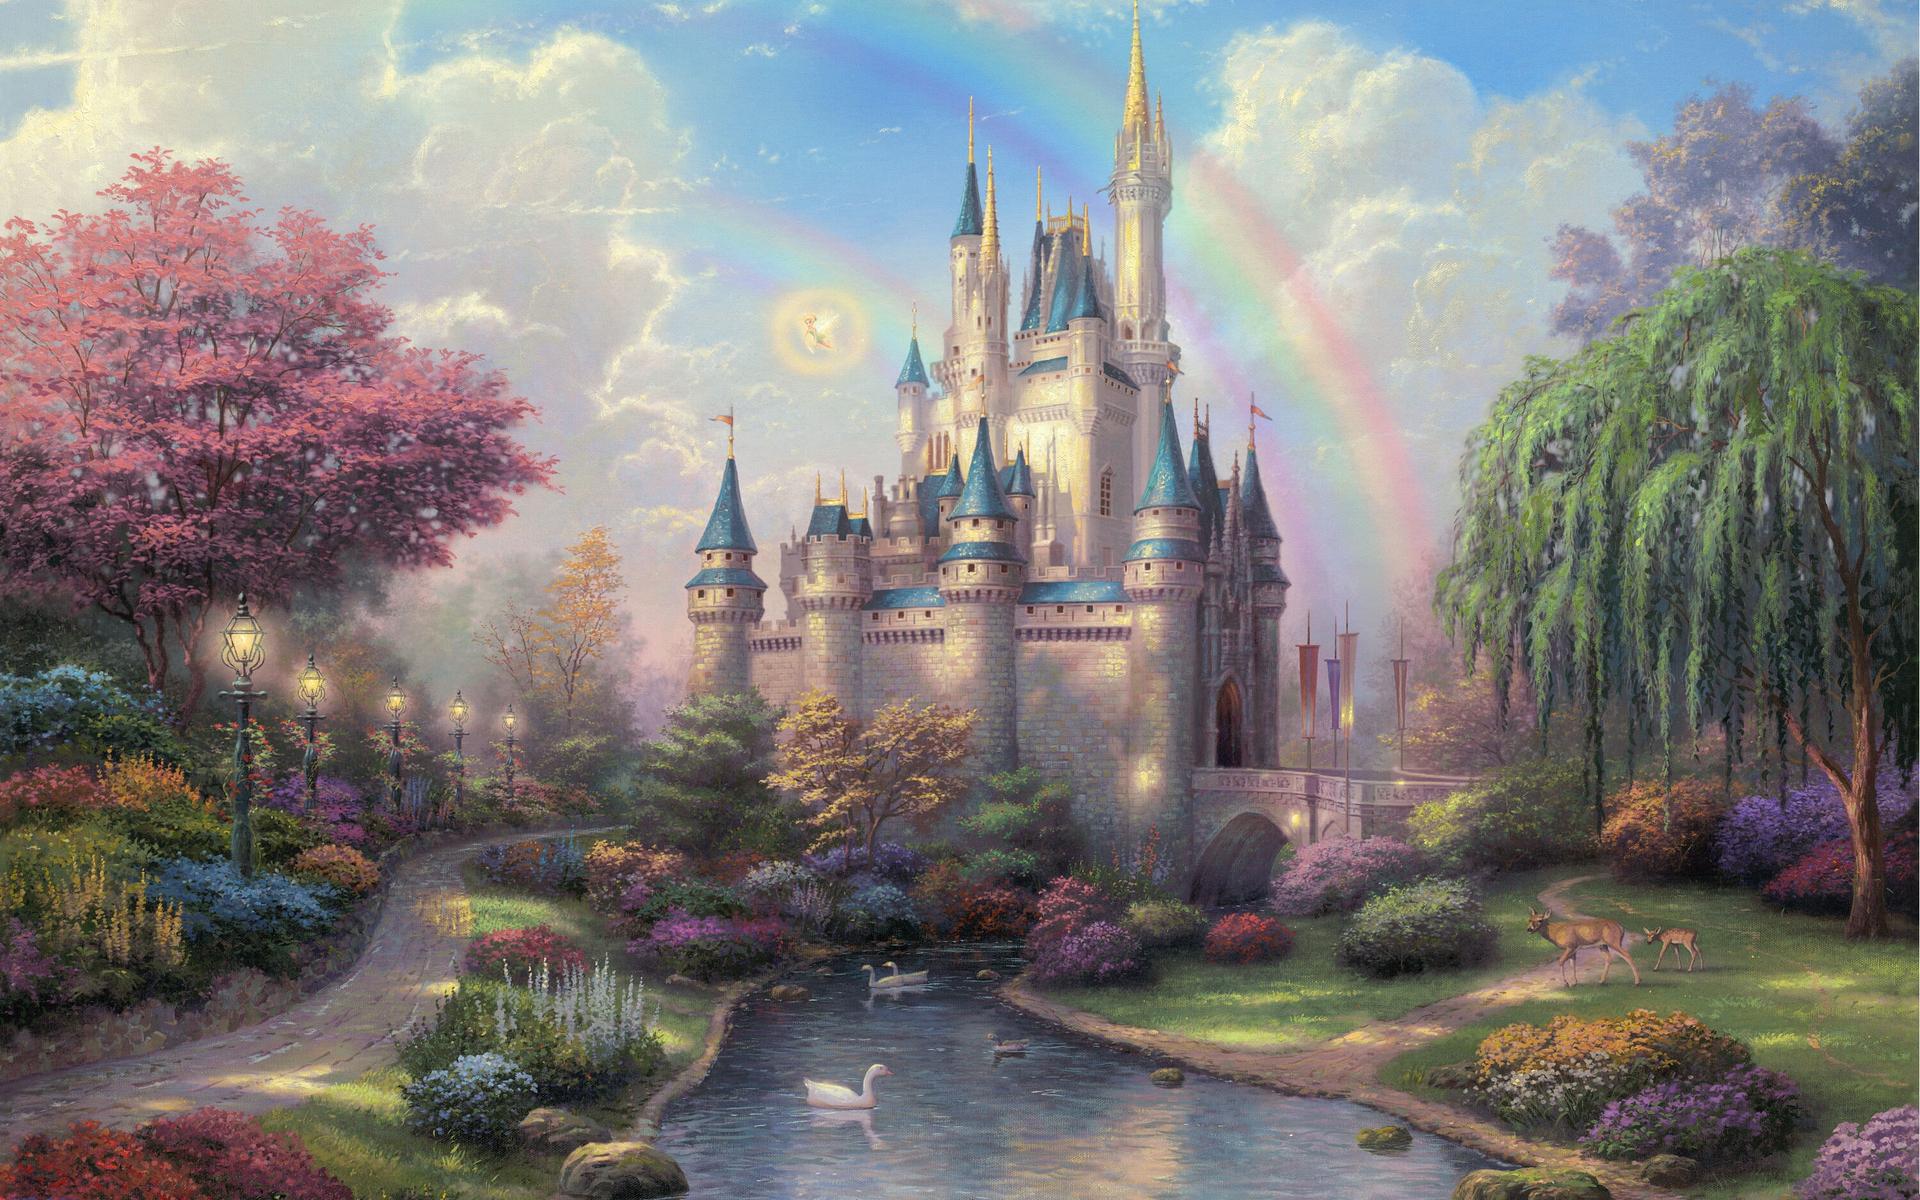 Thomas Kinkade Disney Desktop Wallpaper 1920x1200